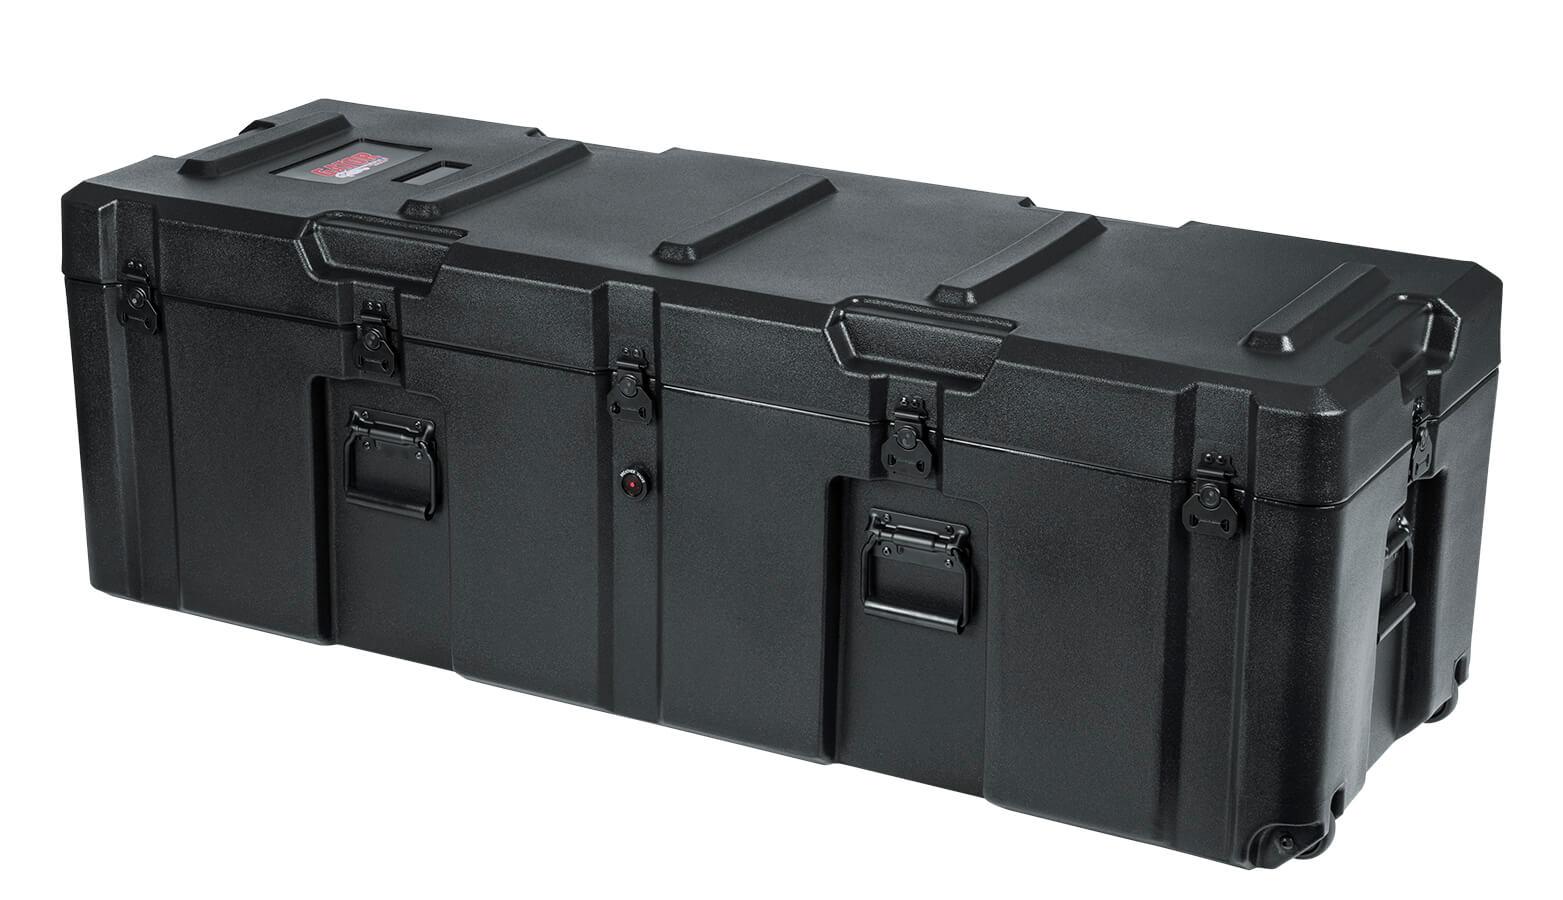 GXR-5517-1503